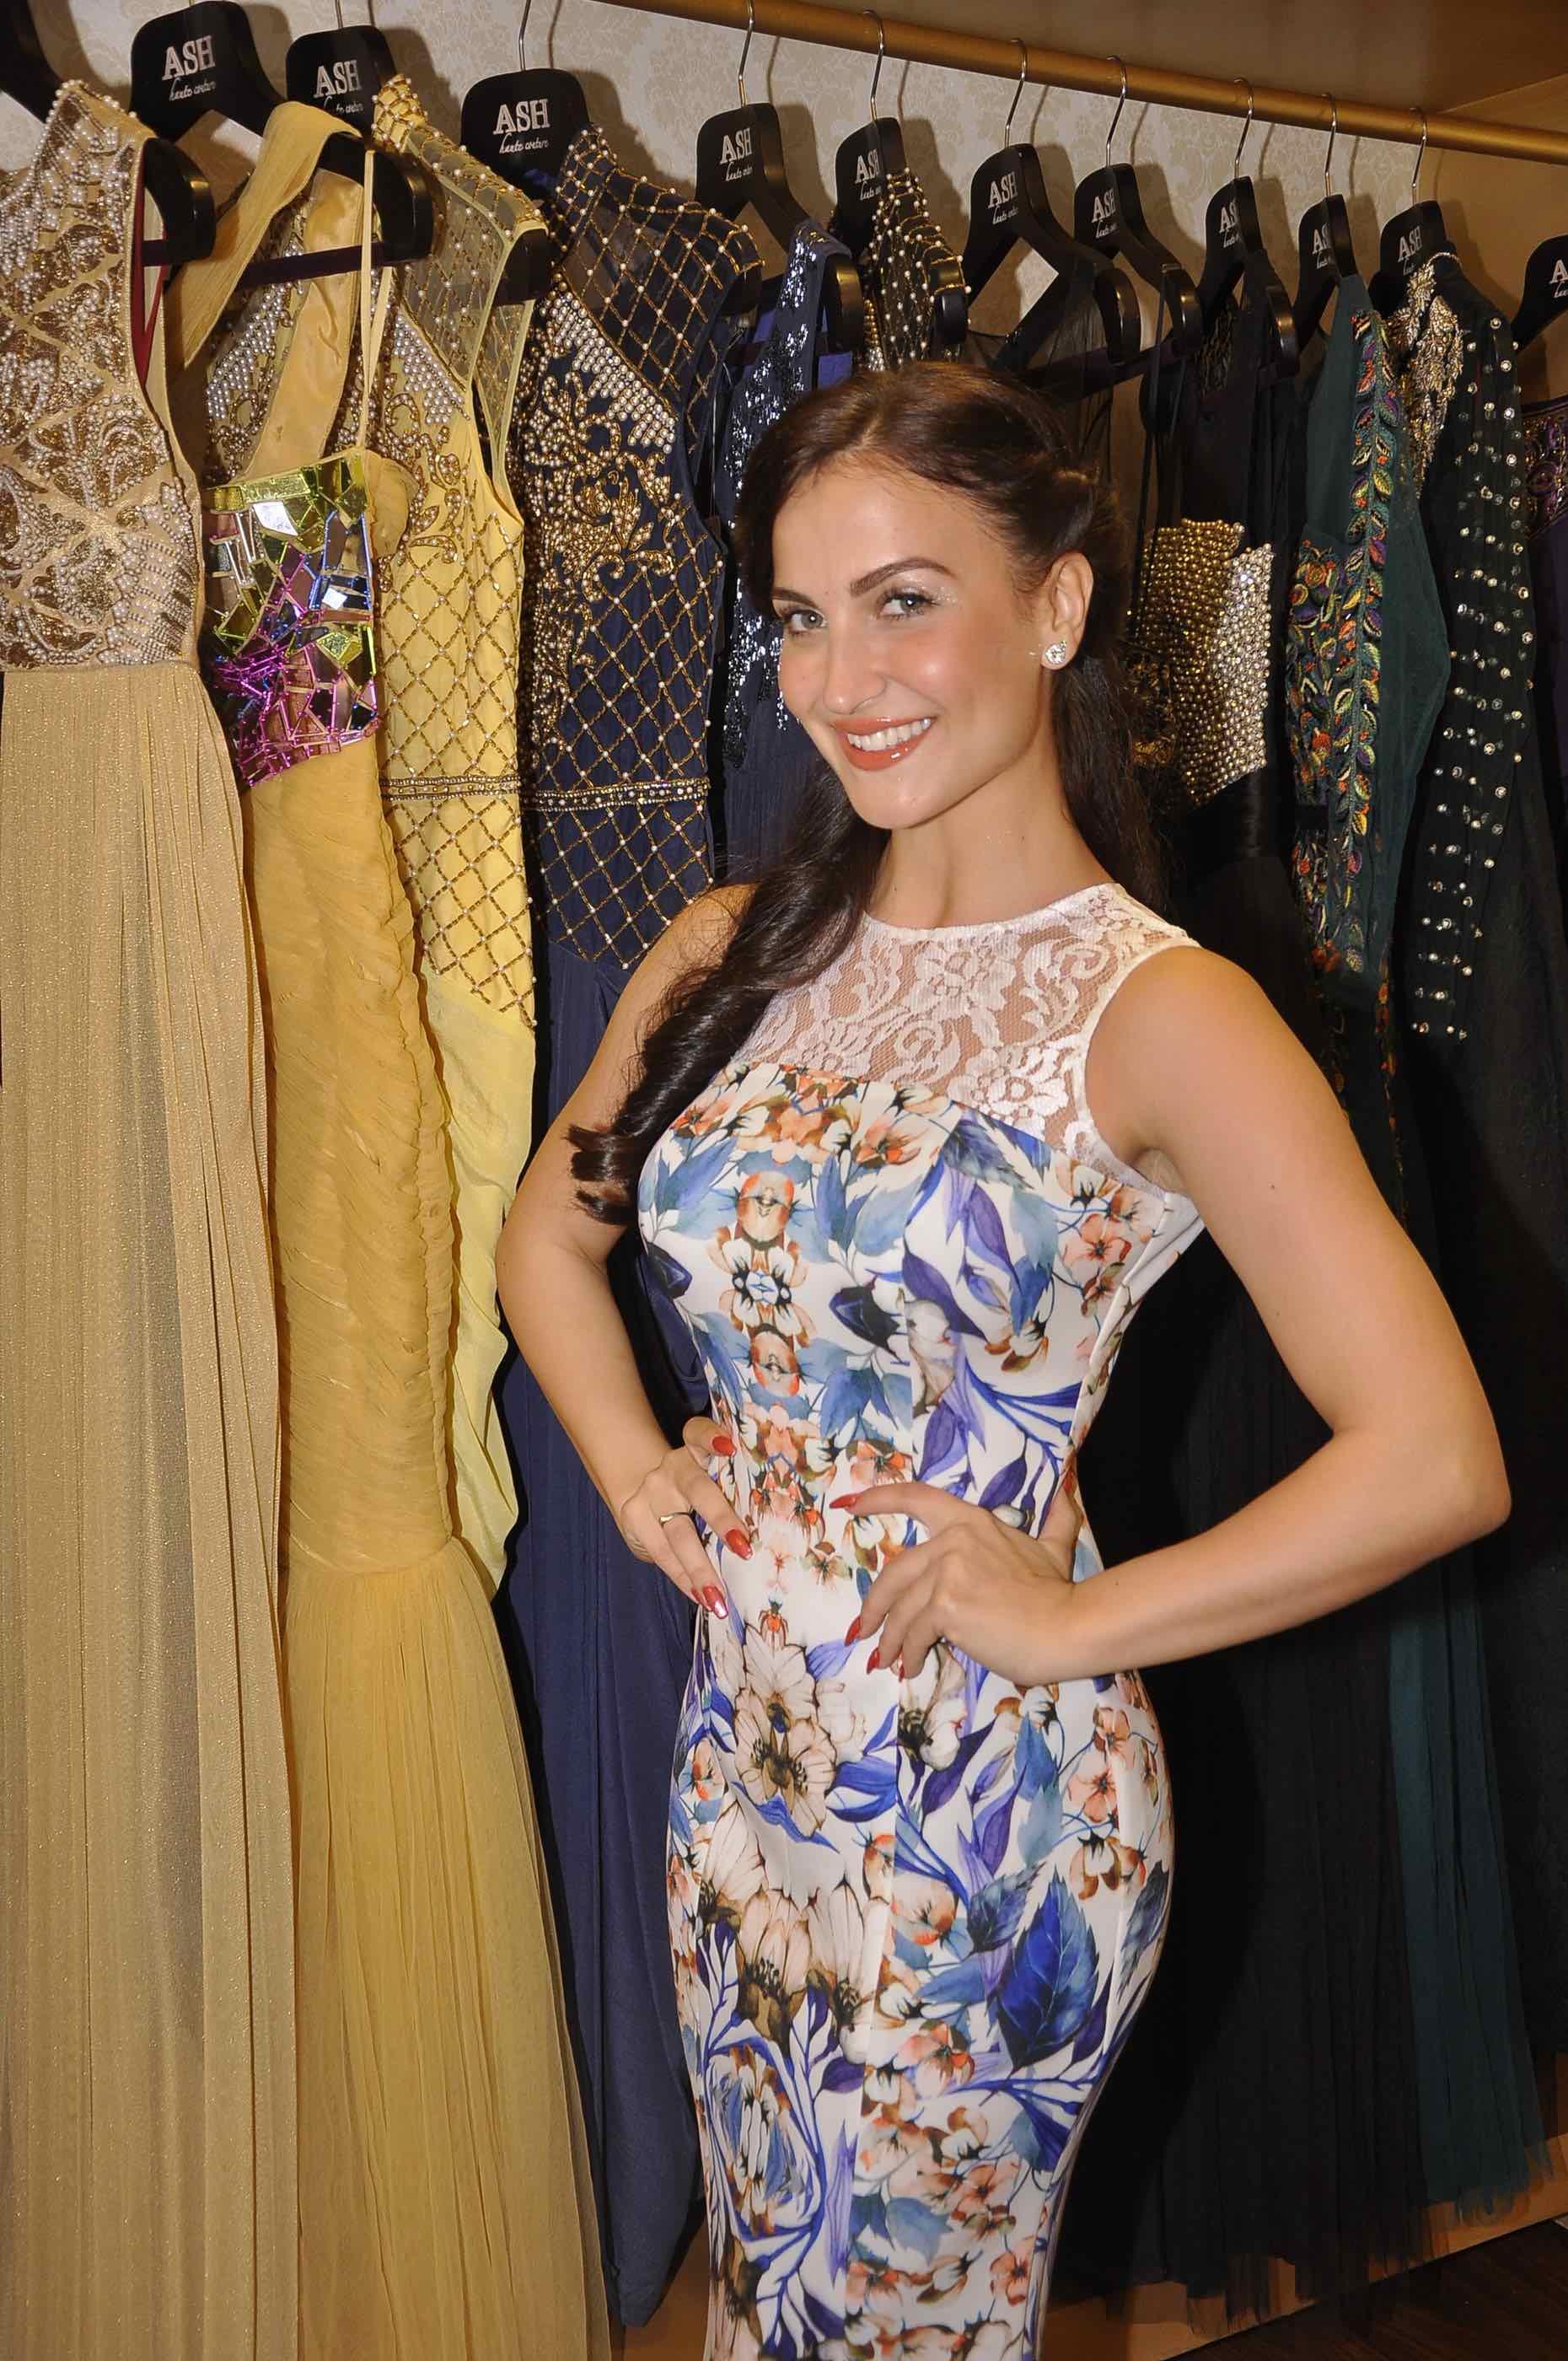 Eli Avram in Ashna Kalra Ash Haute Couture